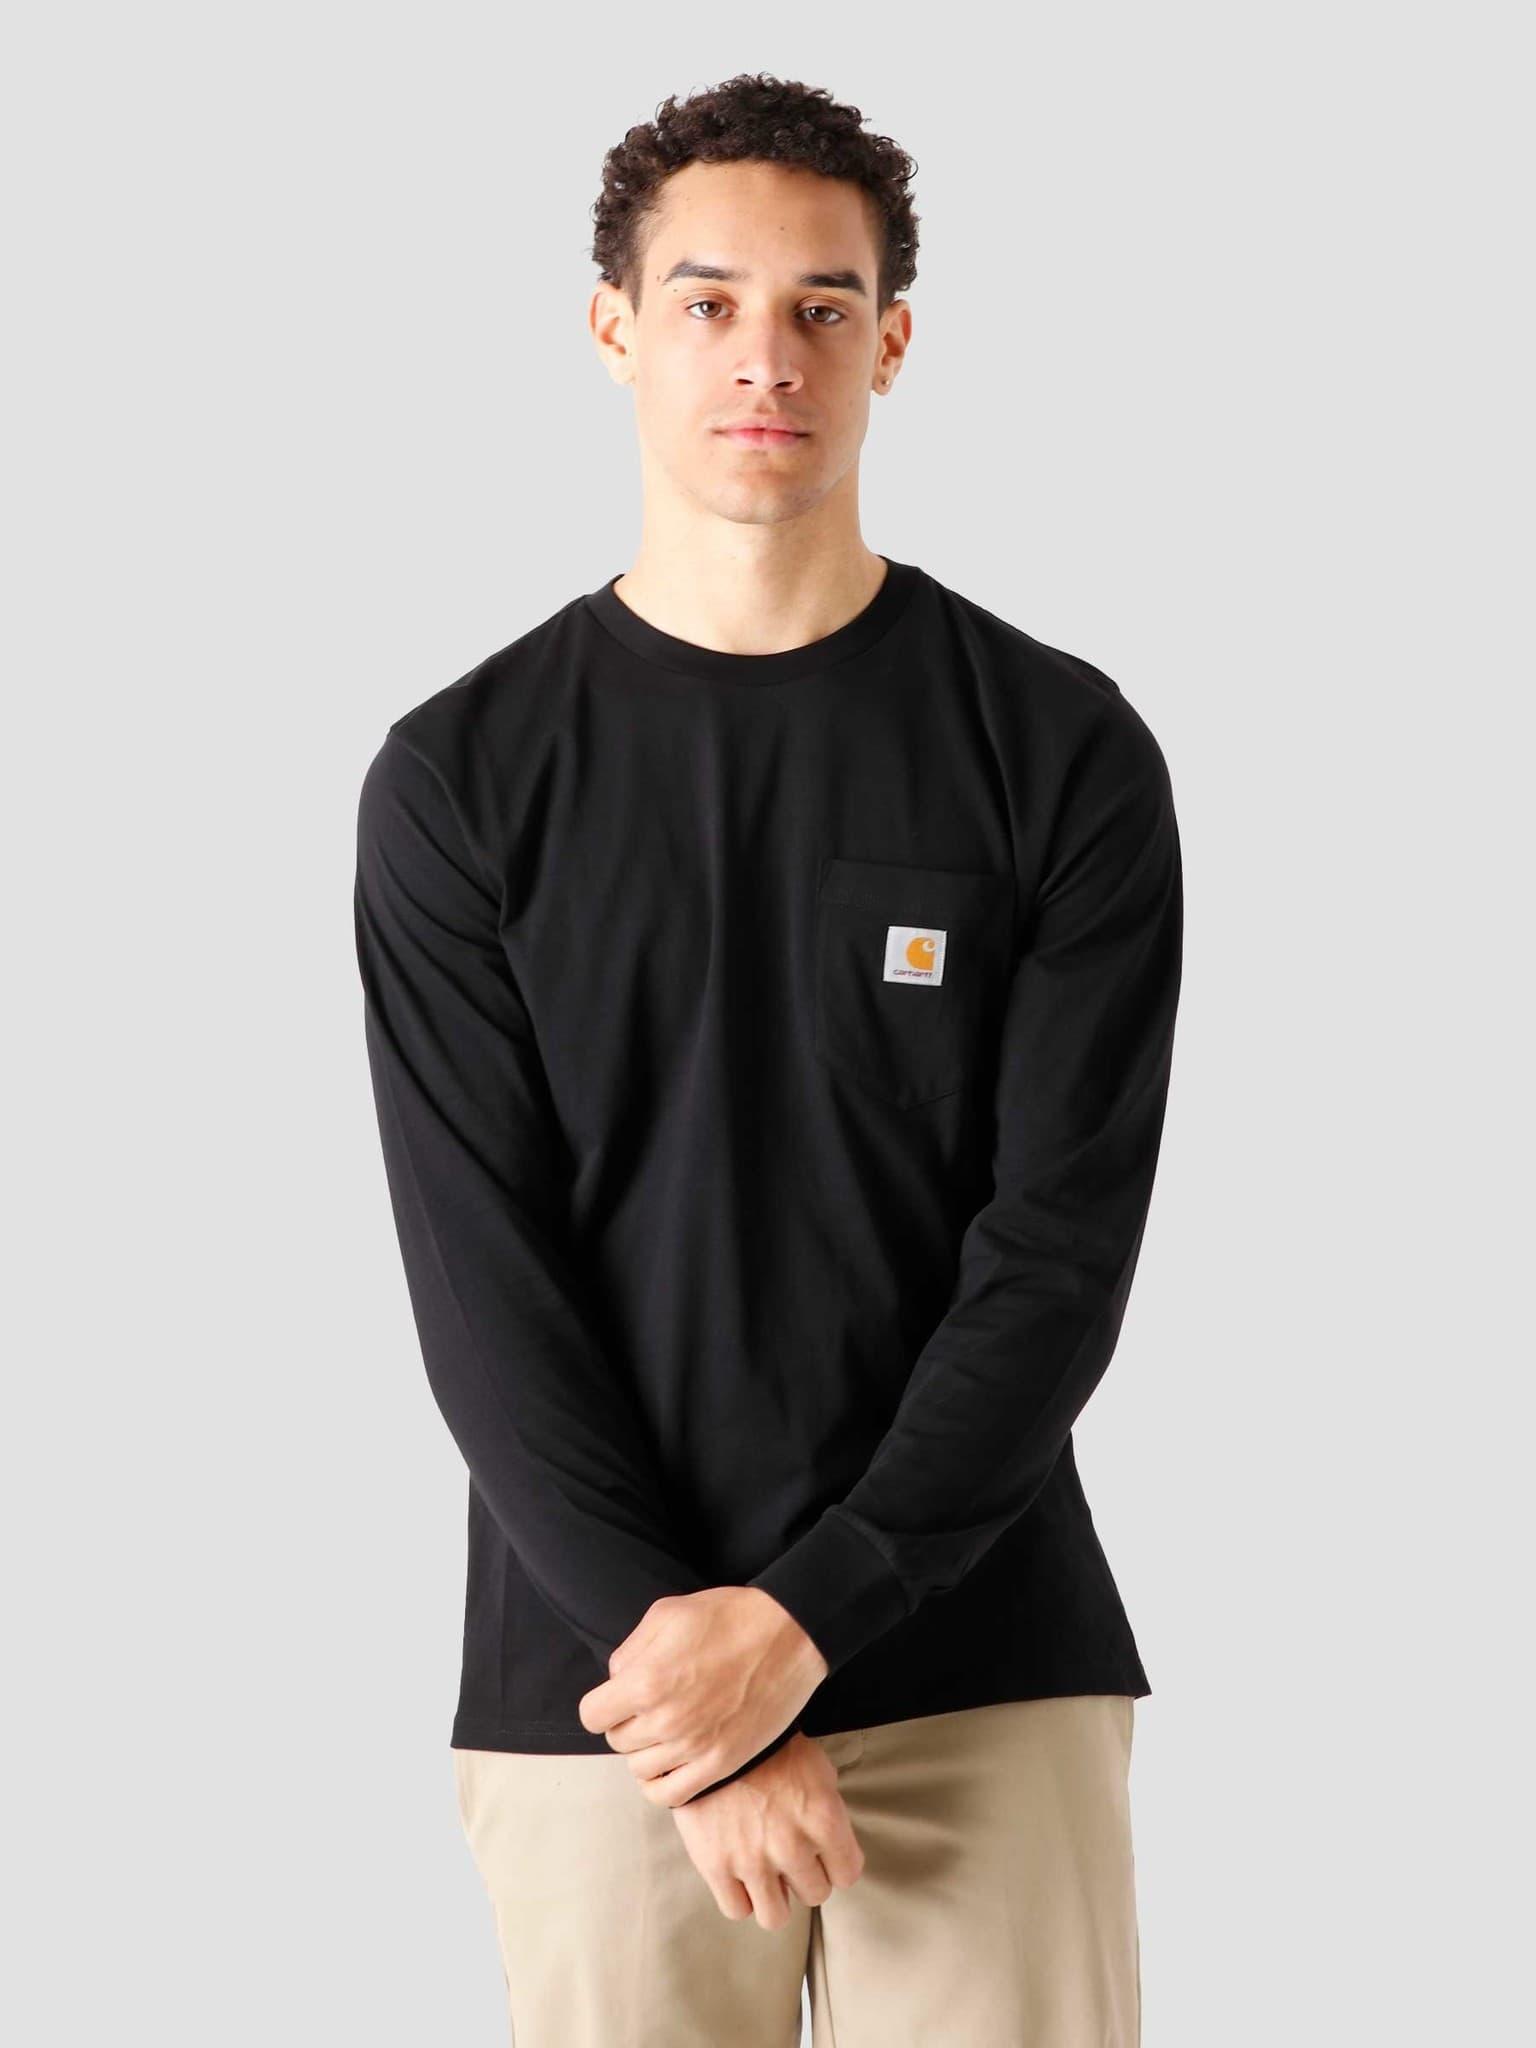 Pocket Longsleeve Black I022094 8900